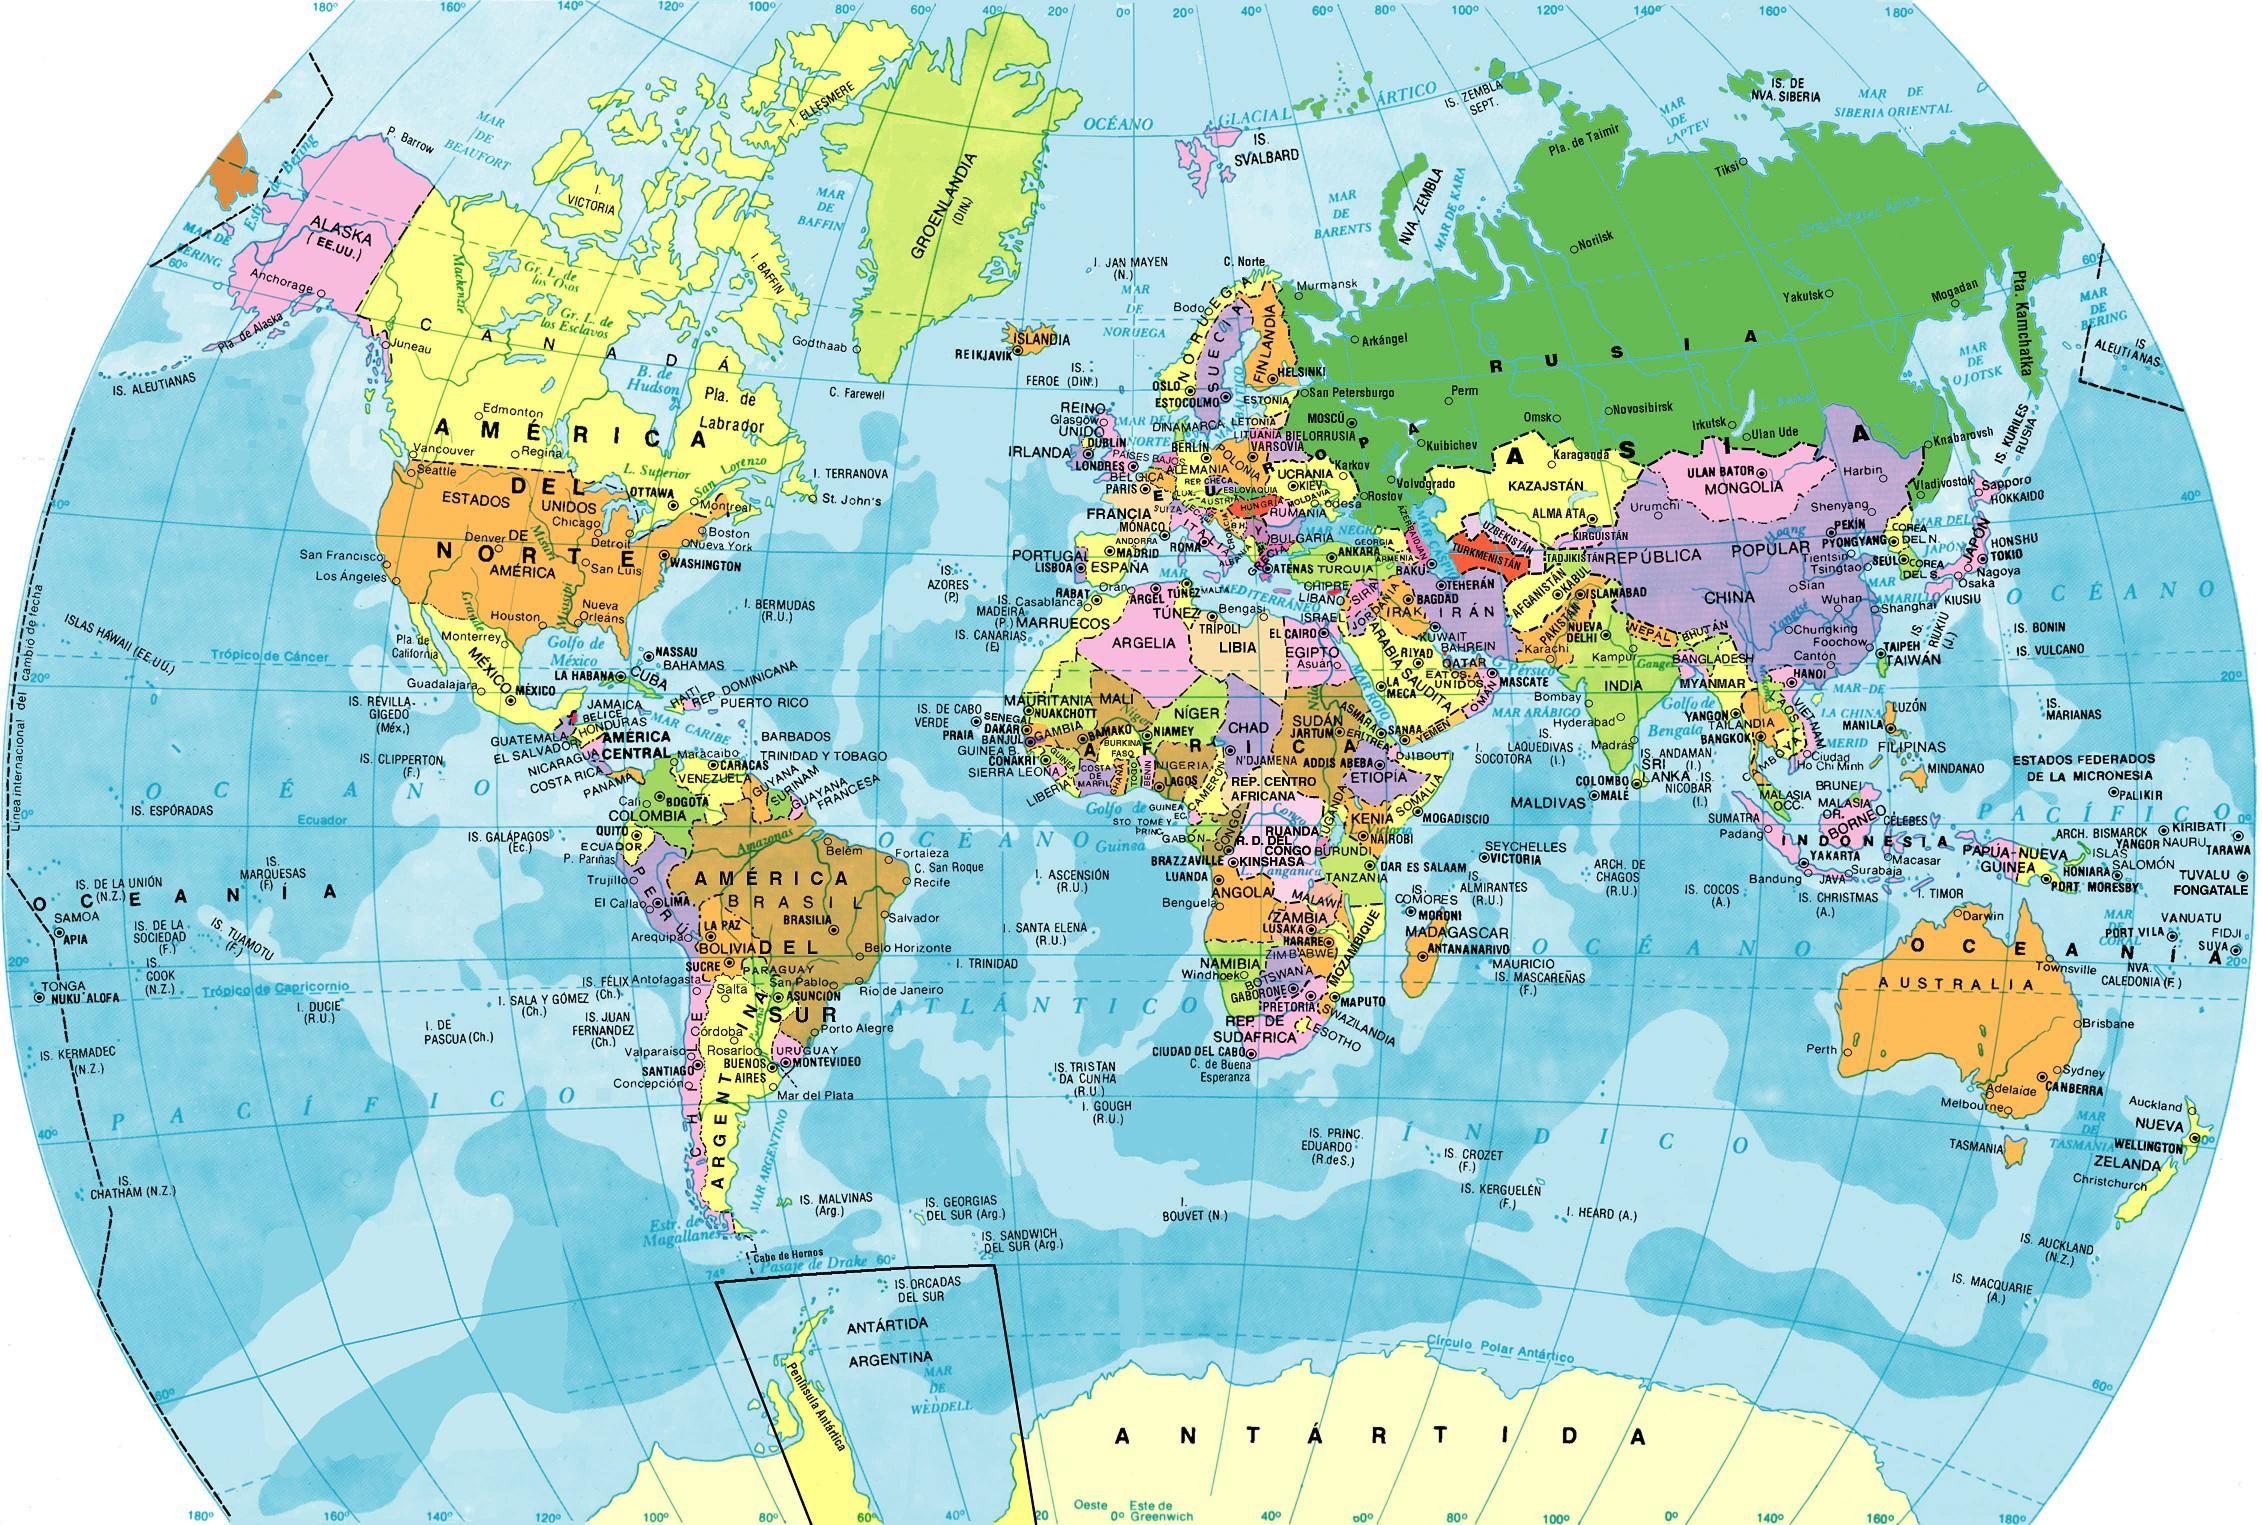 Mapa Del Mundo Paises Para Imprimir.Mapas Planisferios Para Descargar E Imprimir Universo Guia